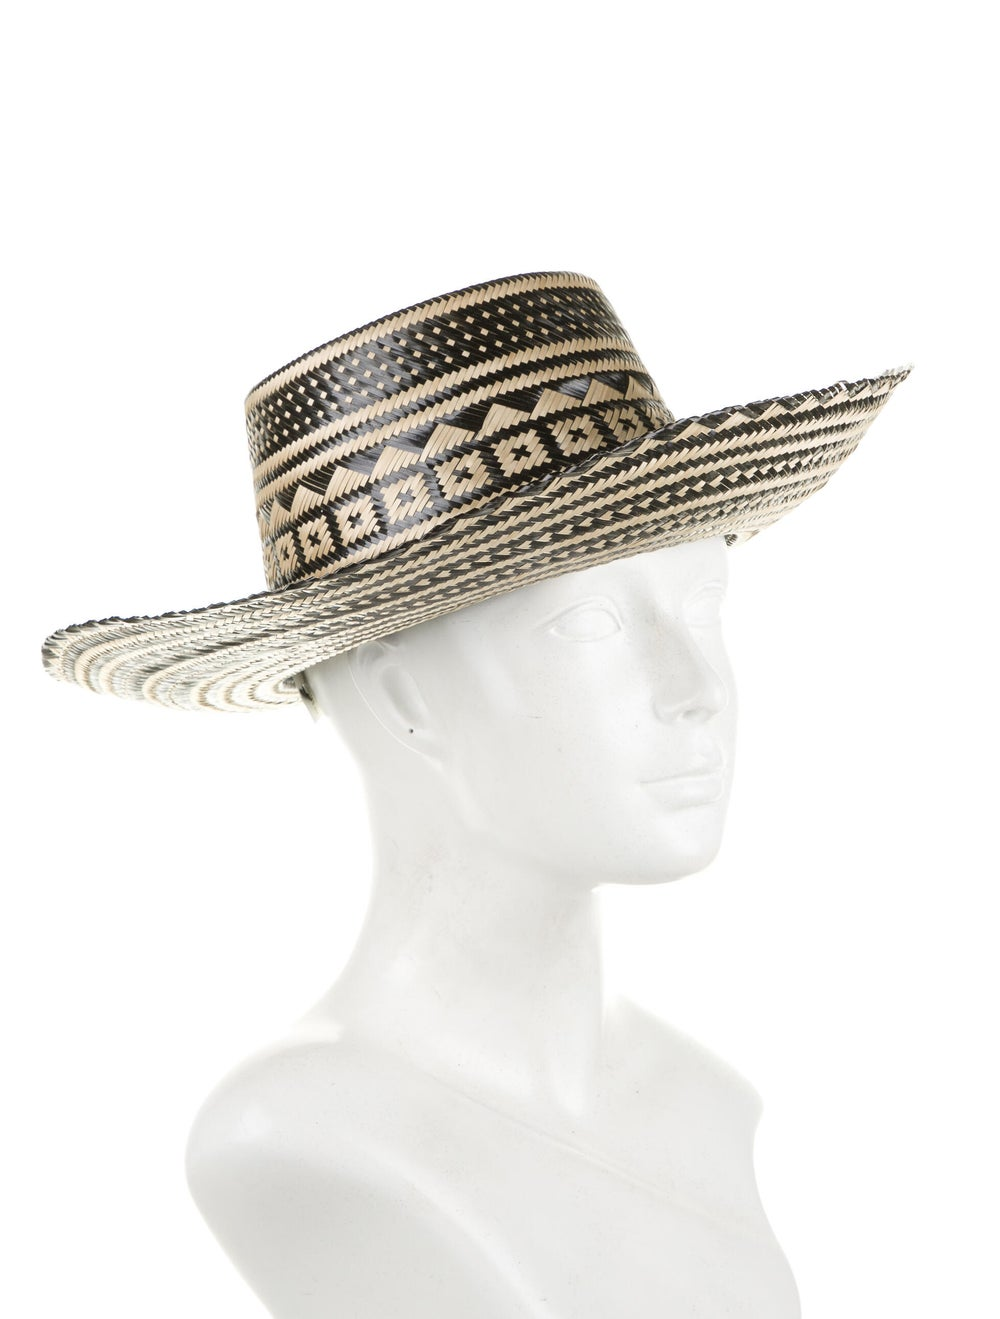 Yosuzi Straw Wide-Brim Hat Tan - image 3